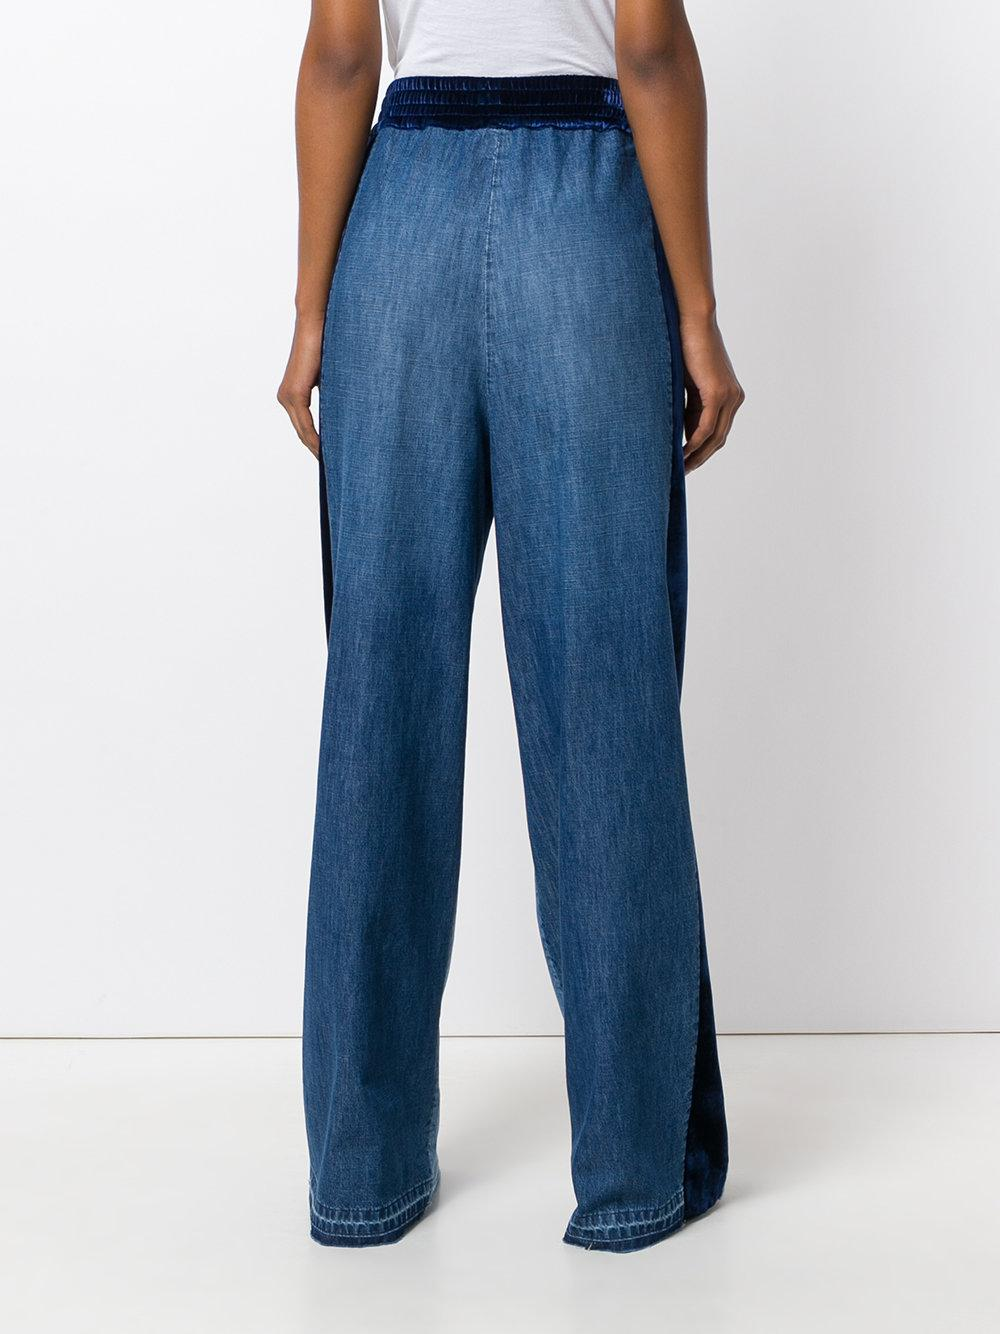 Golden Goose Deluxe Brand Denim Sophie Jeans in Blue